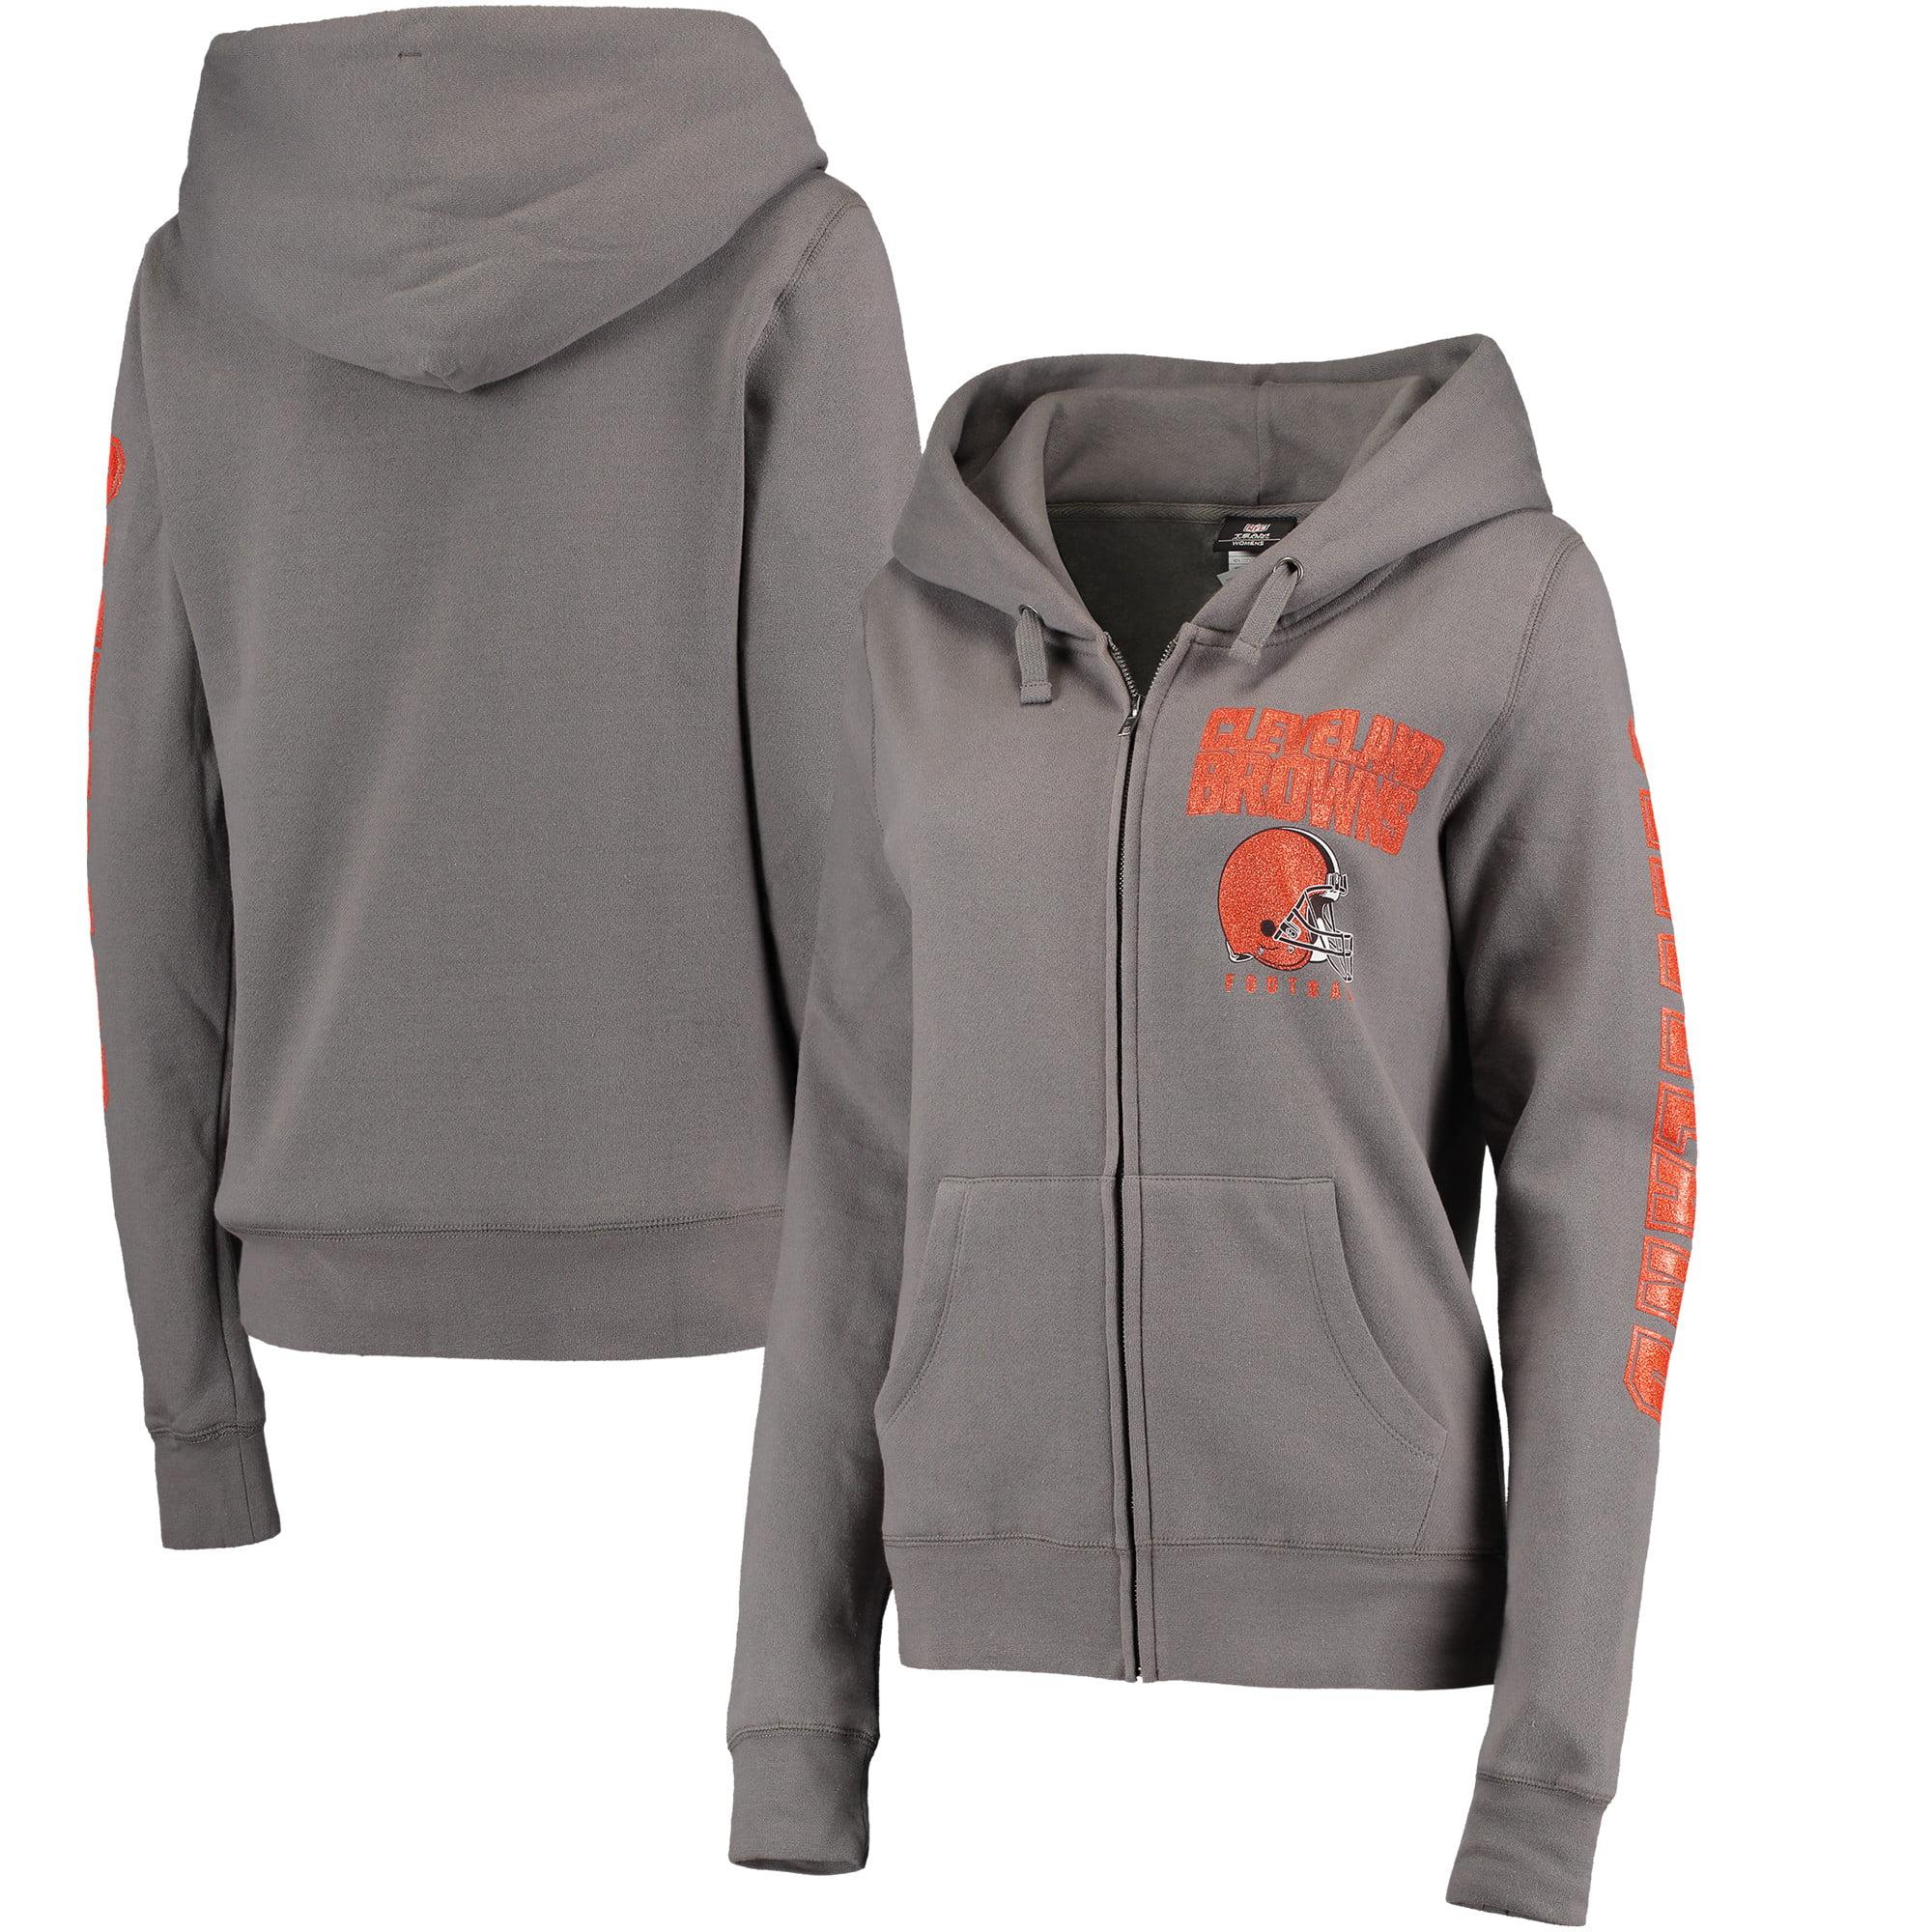 Cleveland Browns New Era Women's Playbook Glitter Sleeve Full-Zip Hoodie - Gray